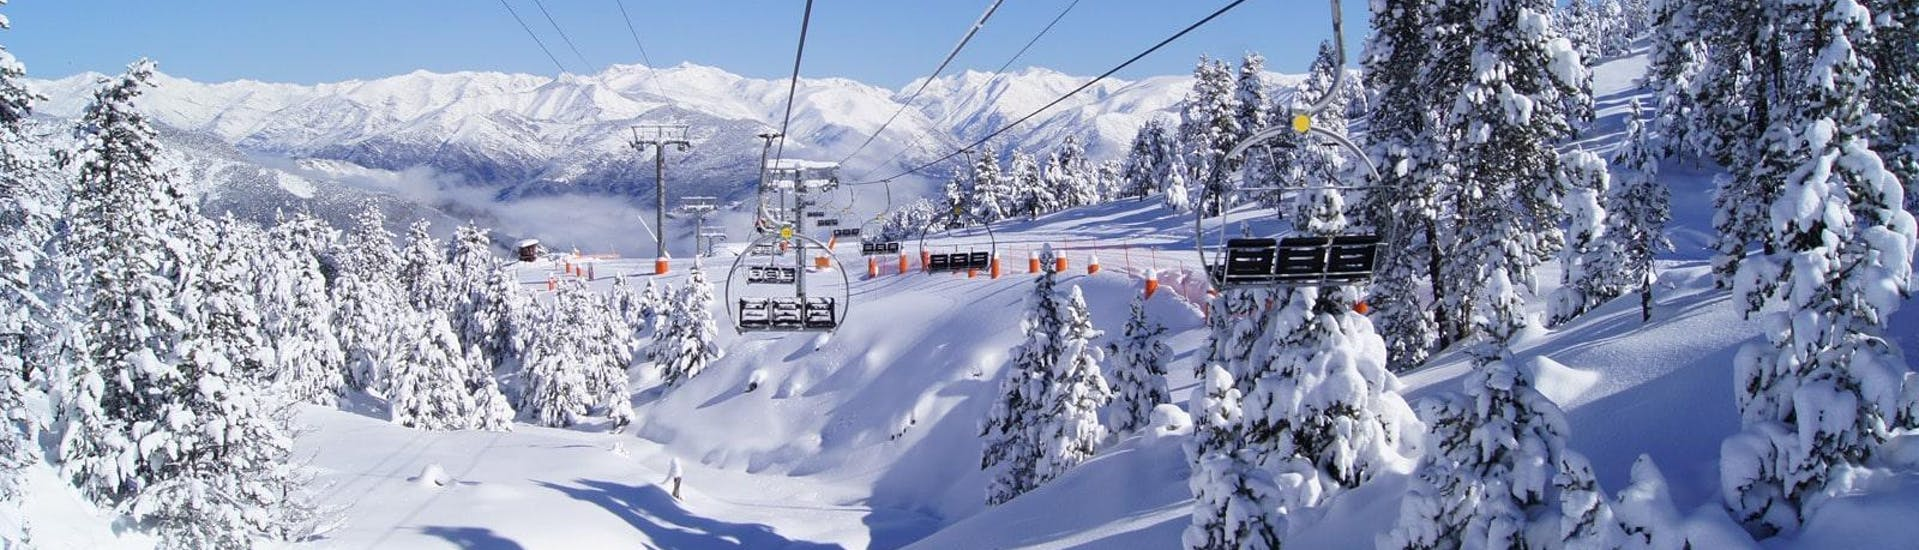 Ski Lessons for Kids (5-14 years) - Weekend avec Escola d'Esquí Pallars Sobira - Hero image